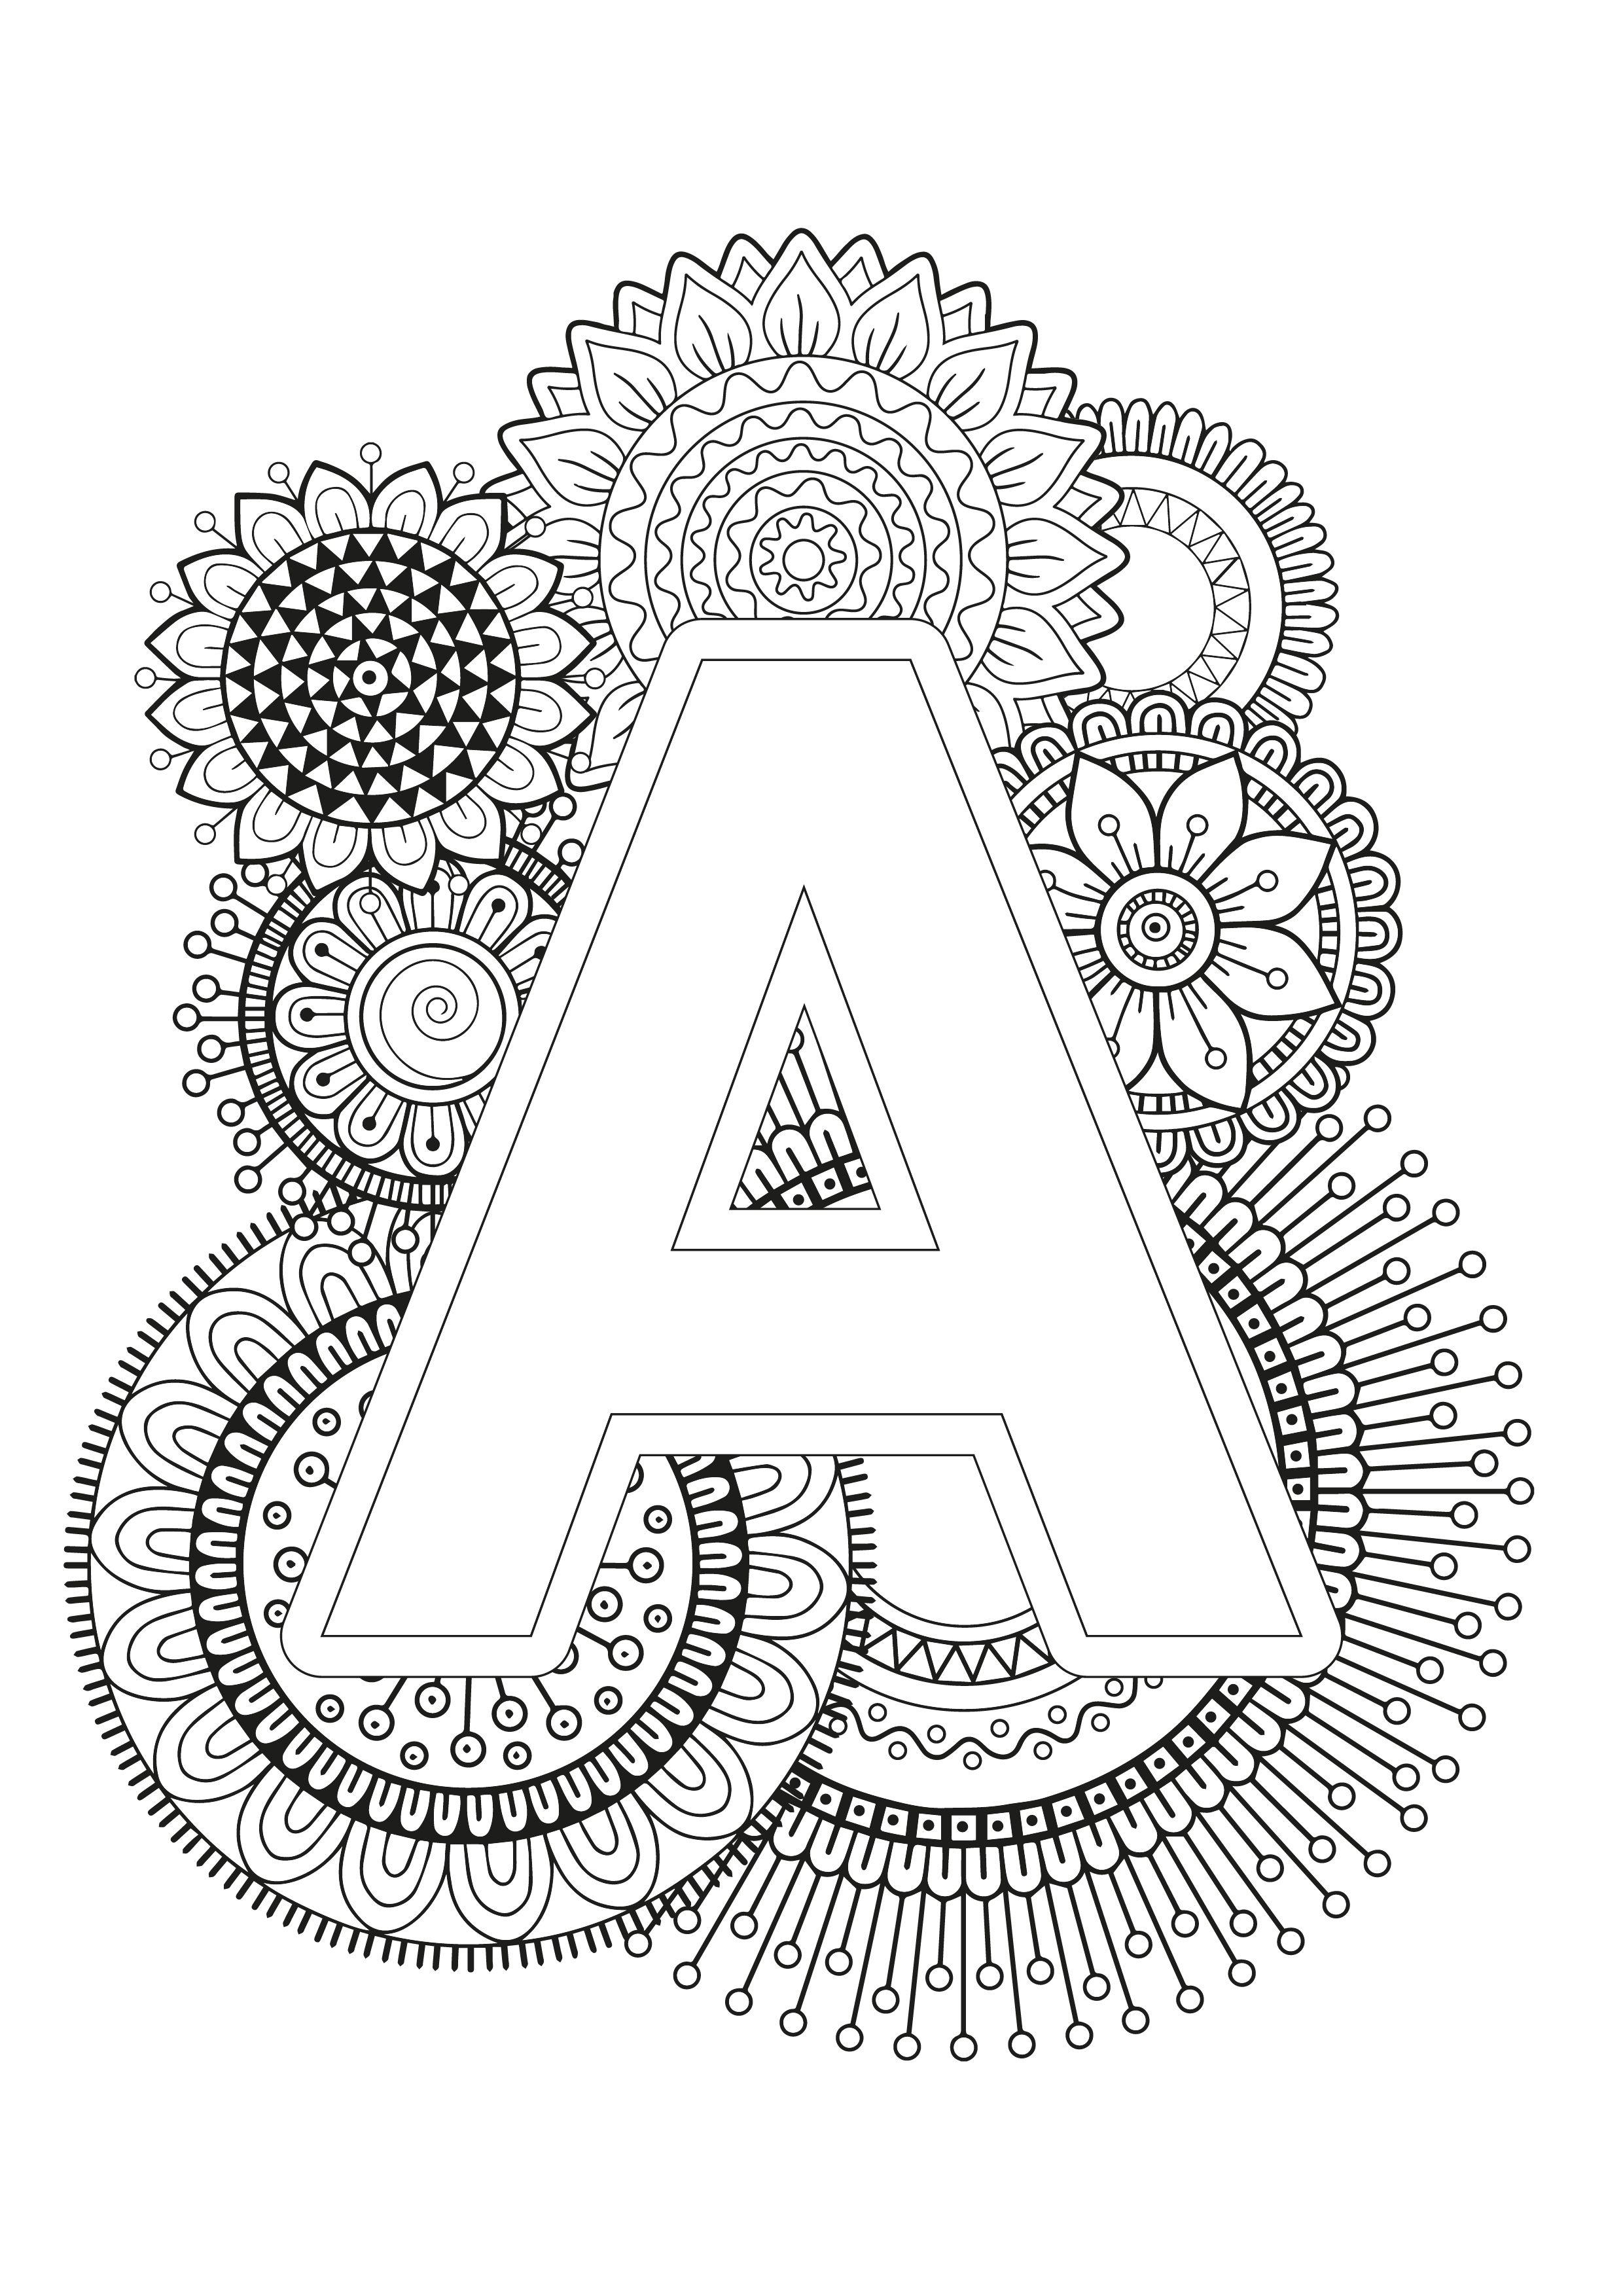 Mindfulness Coloring Page Alphabet Mandala Coloring Pages Abstract Coloring Pages Mandala Coloring